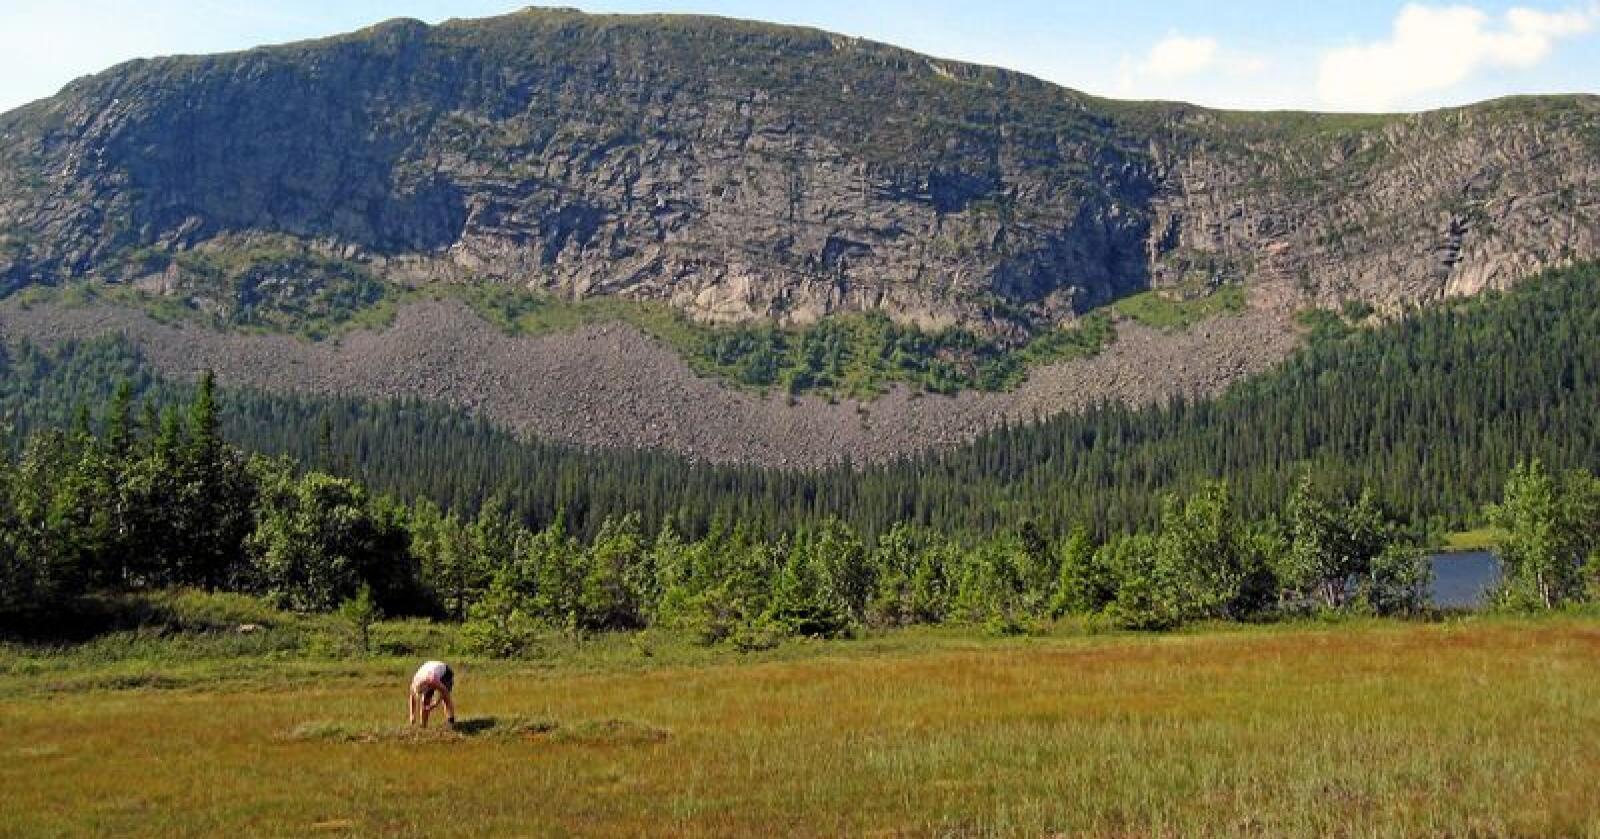 Lagring: Det er beregnet at norske myrer lagrer karbon tilsvarende minst 3500 millioner tonn CO2-ekvivalenter, skriver Ola Elvestuen. Foto: Lise Åserud / NTB scanpix